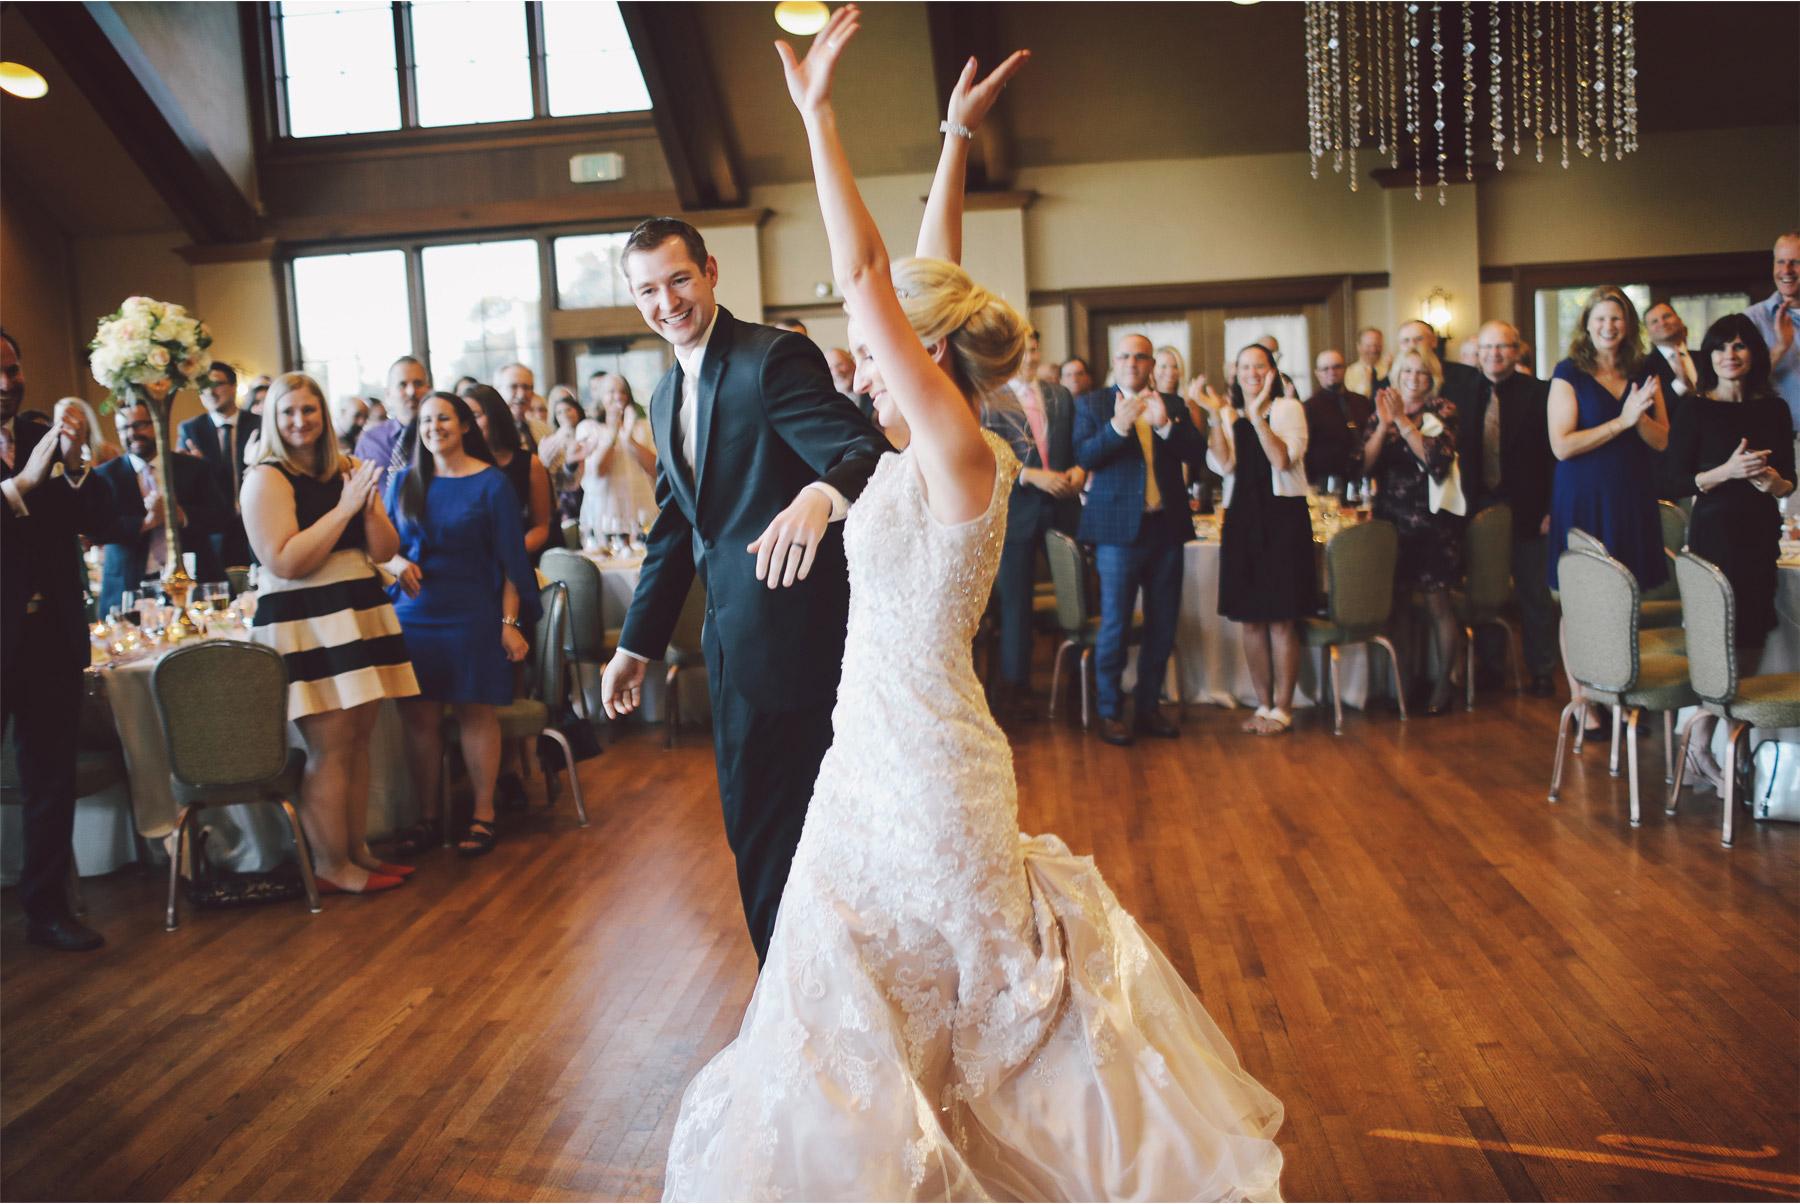 20-Minneapolis-Minnesota-Wedding-Photography-by-Vick-Photography-Golf-Course-Interlachen-Country-Club--Reception-Jenna-and-Josh.jpg